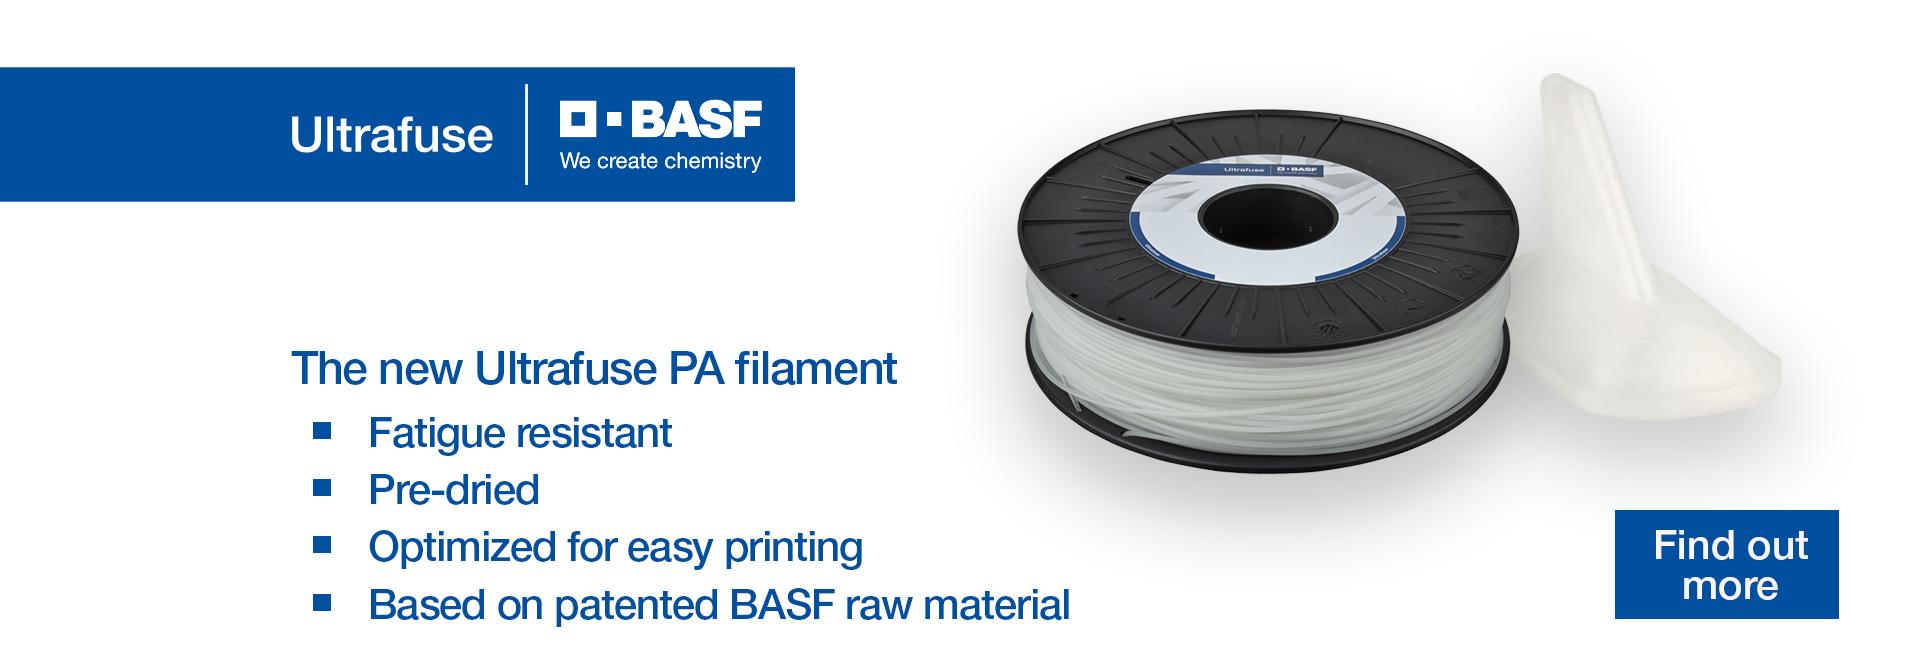 BASF Ultrafuse